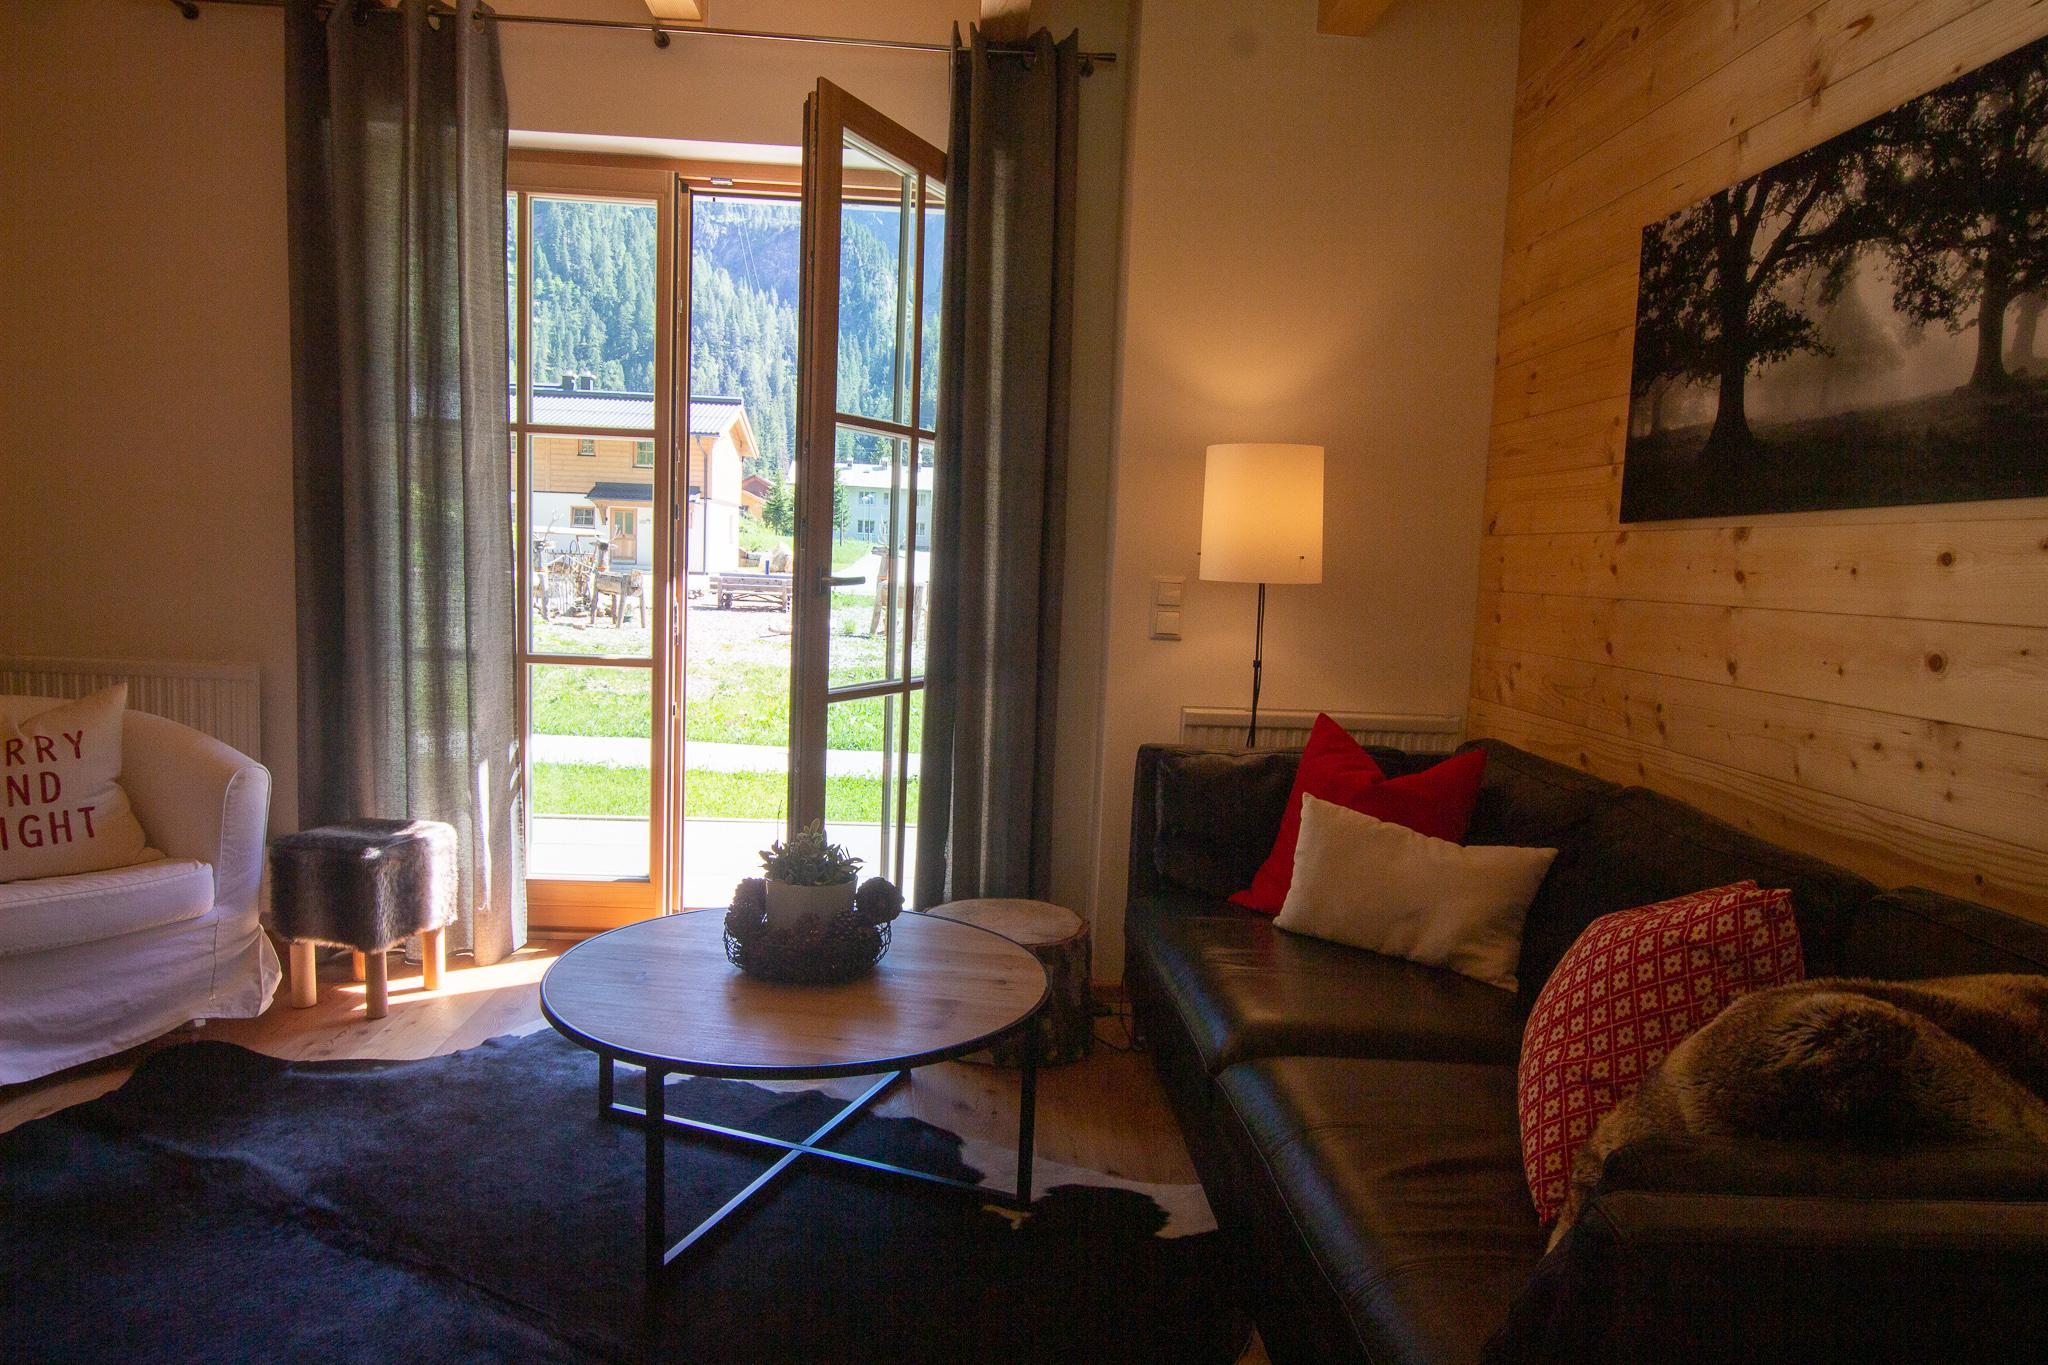 Maison de vacances Lodge Seeblick am Skilift und Bergsee für 5 (2636751), Uttendorf, Pinzgau, Salzbourg, Autriche, image 2